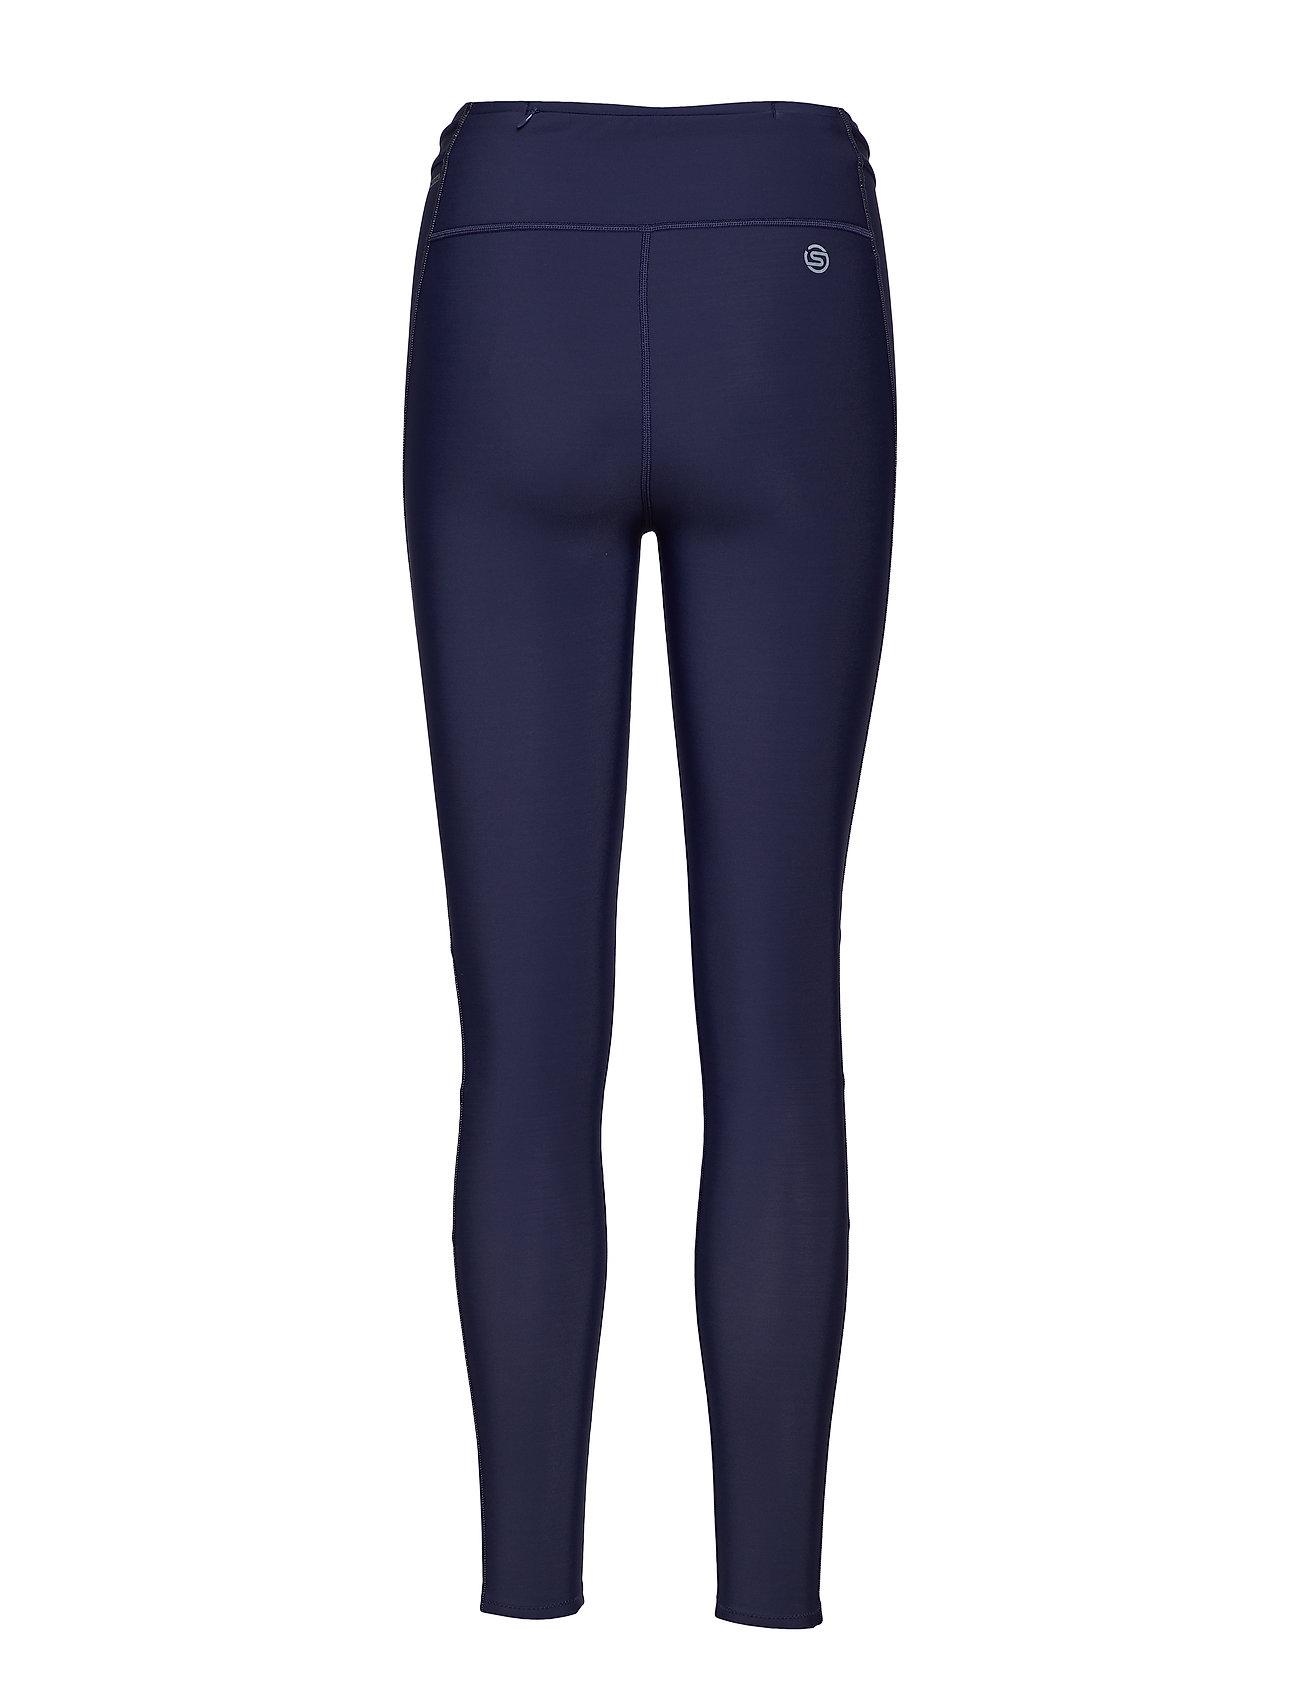 Long Thermal Dnamic Blue bright BluSkins Womens Tightsnavy Aqj4Lc35R